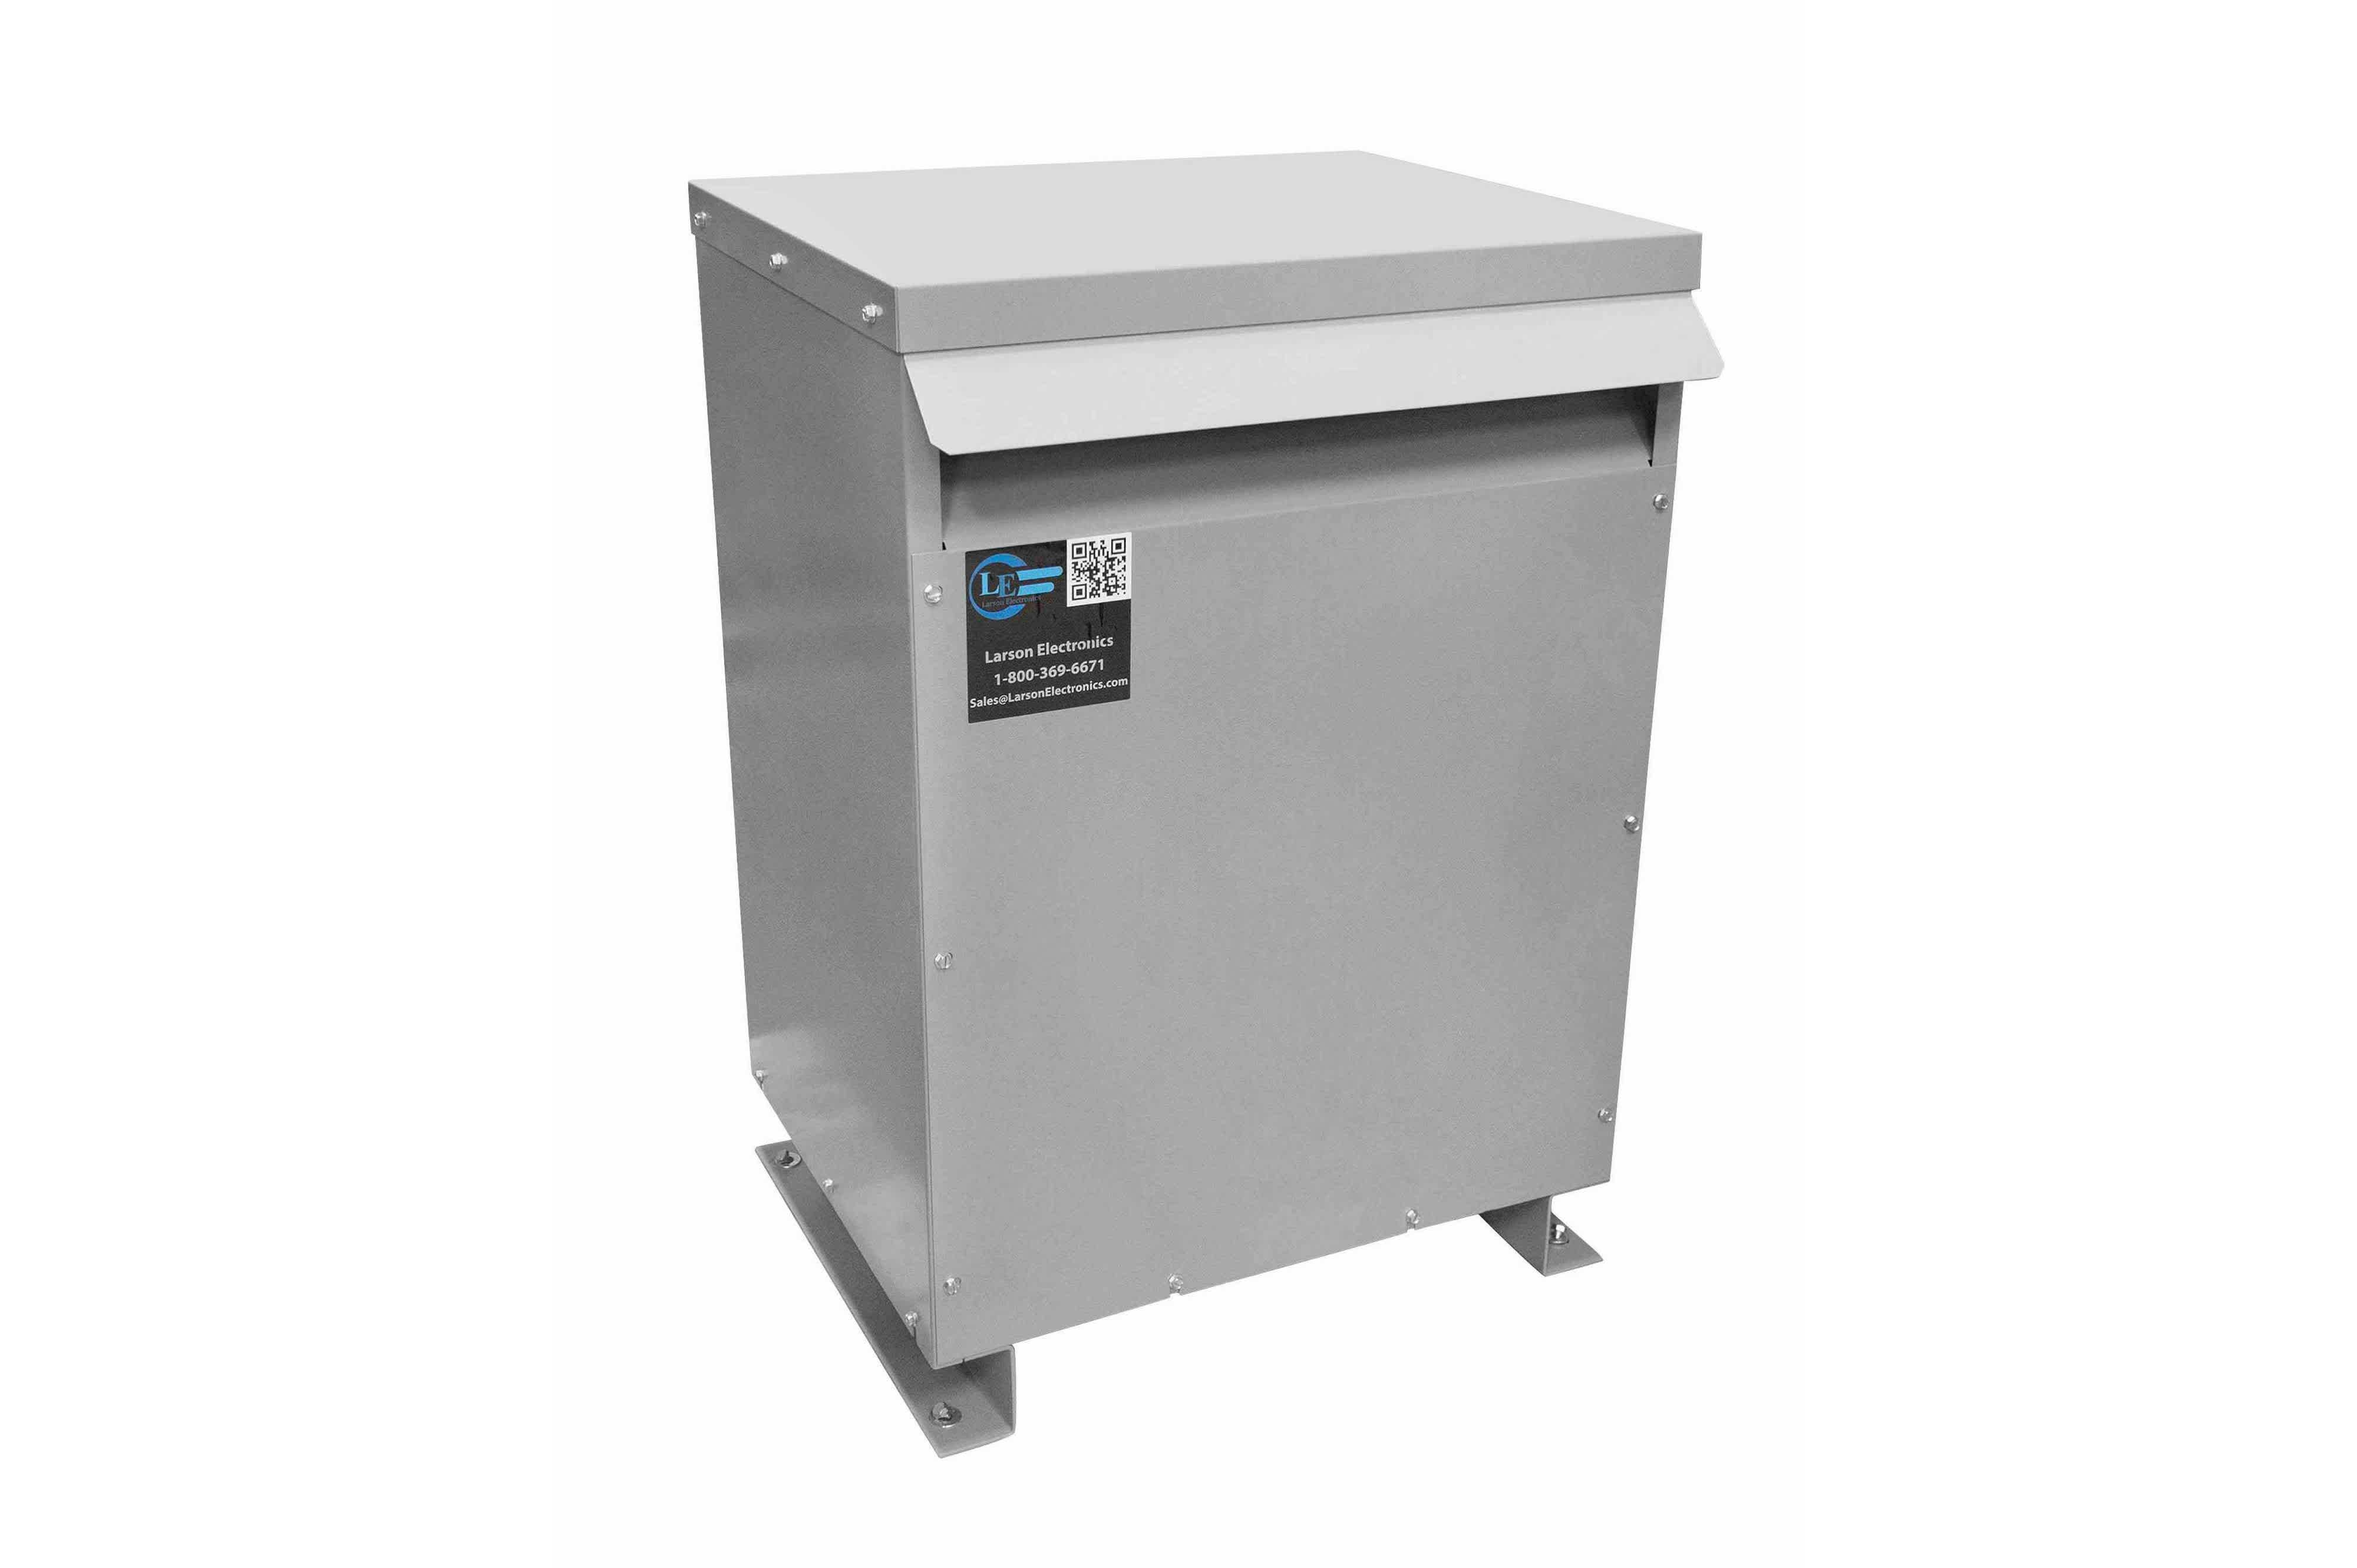 300 kVA 3PH Isolation Transformer, 575V Wye Primary, 480Y/277 Wye-N Secondary, N3R, Ventilated, 60 Hz